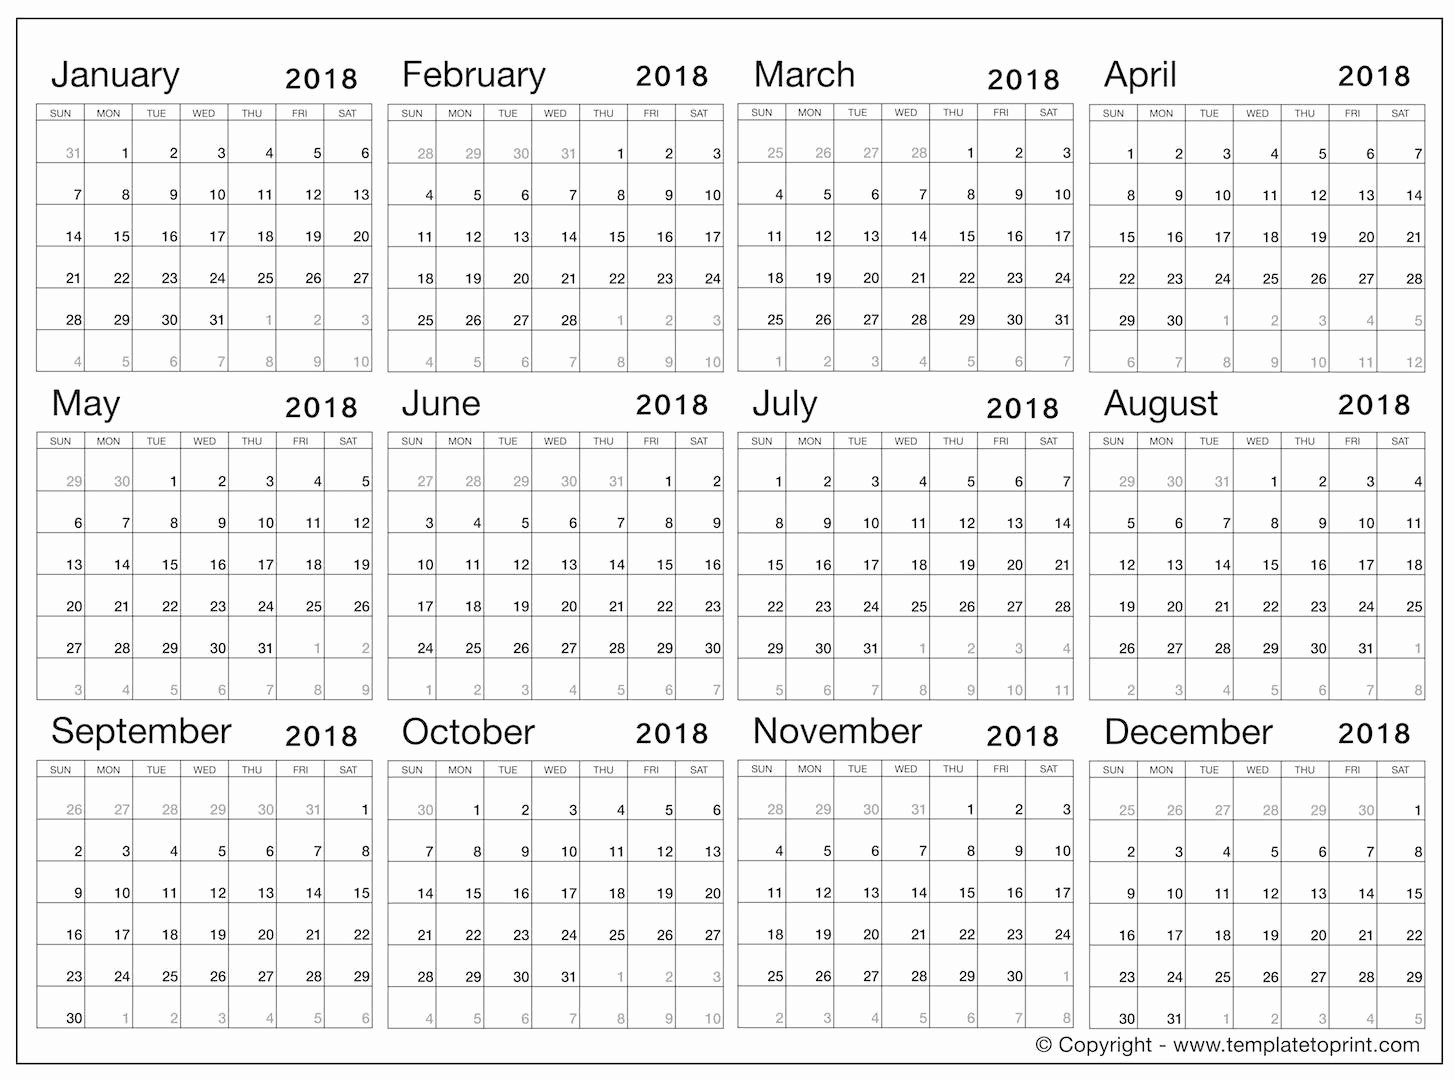 Calendar that I Can Edit Fresh 2018 Calendar Template Word 2018 Calendar Template to Edit